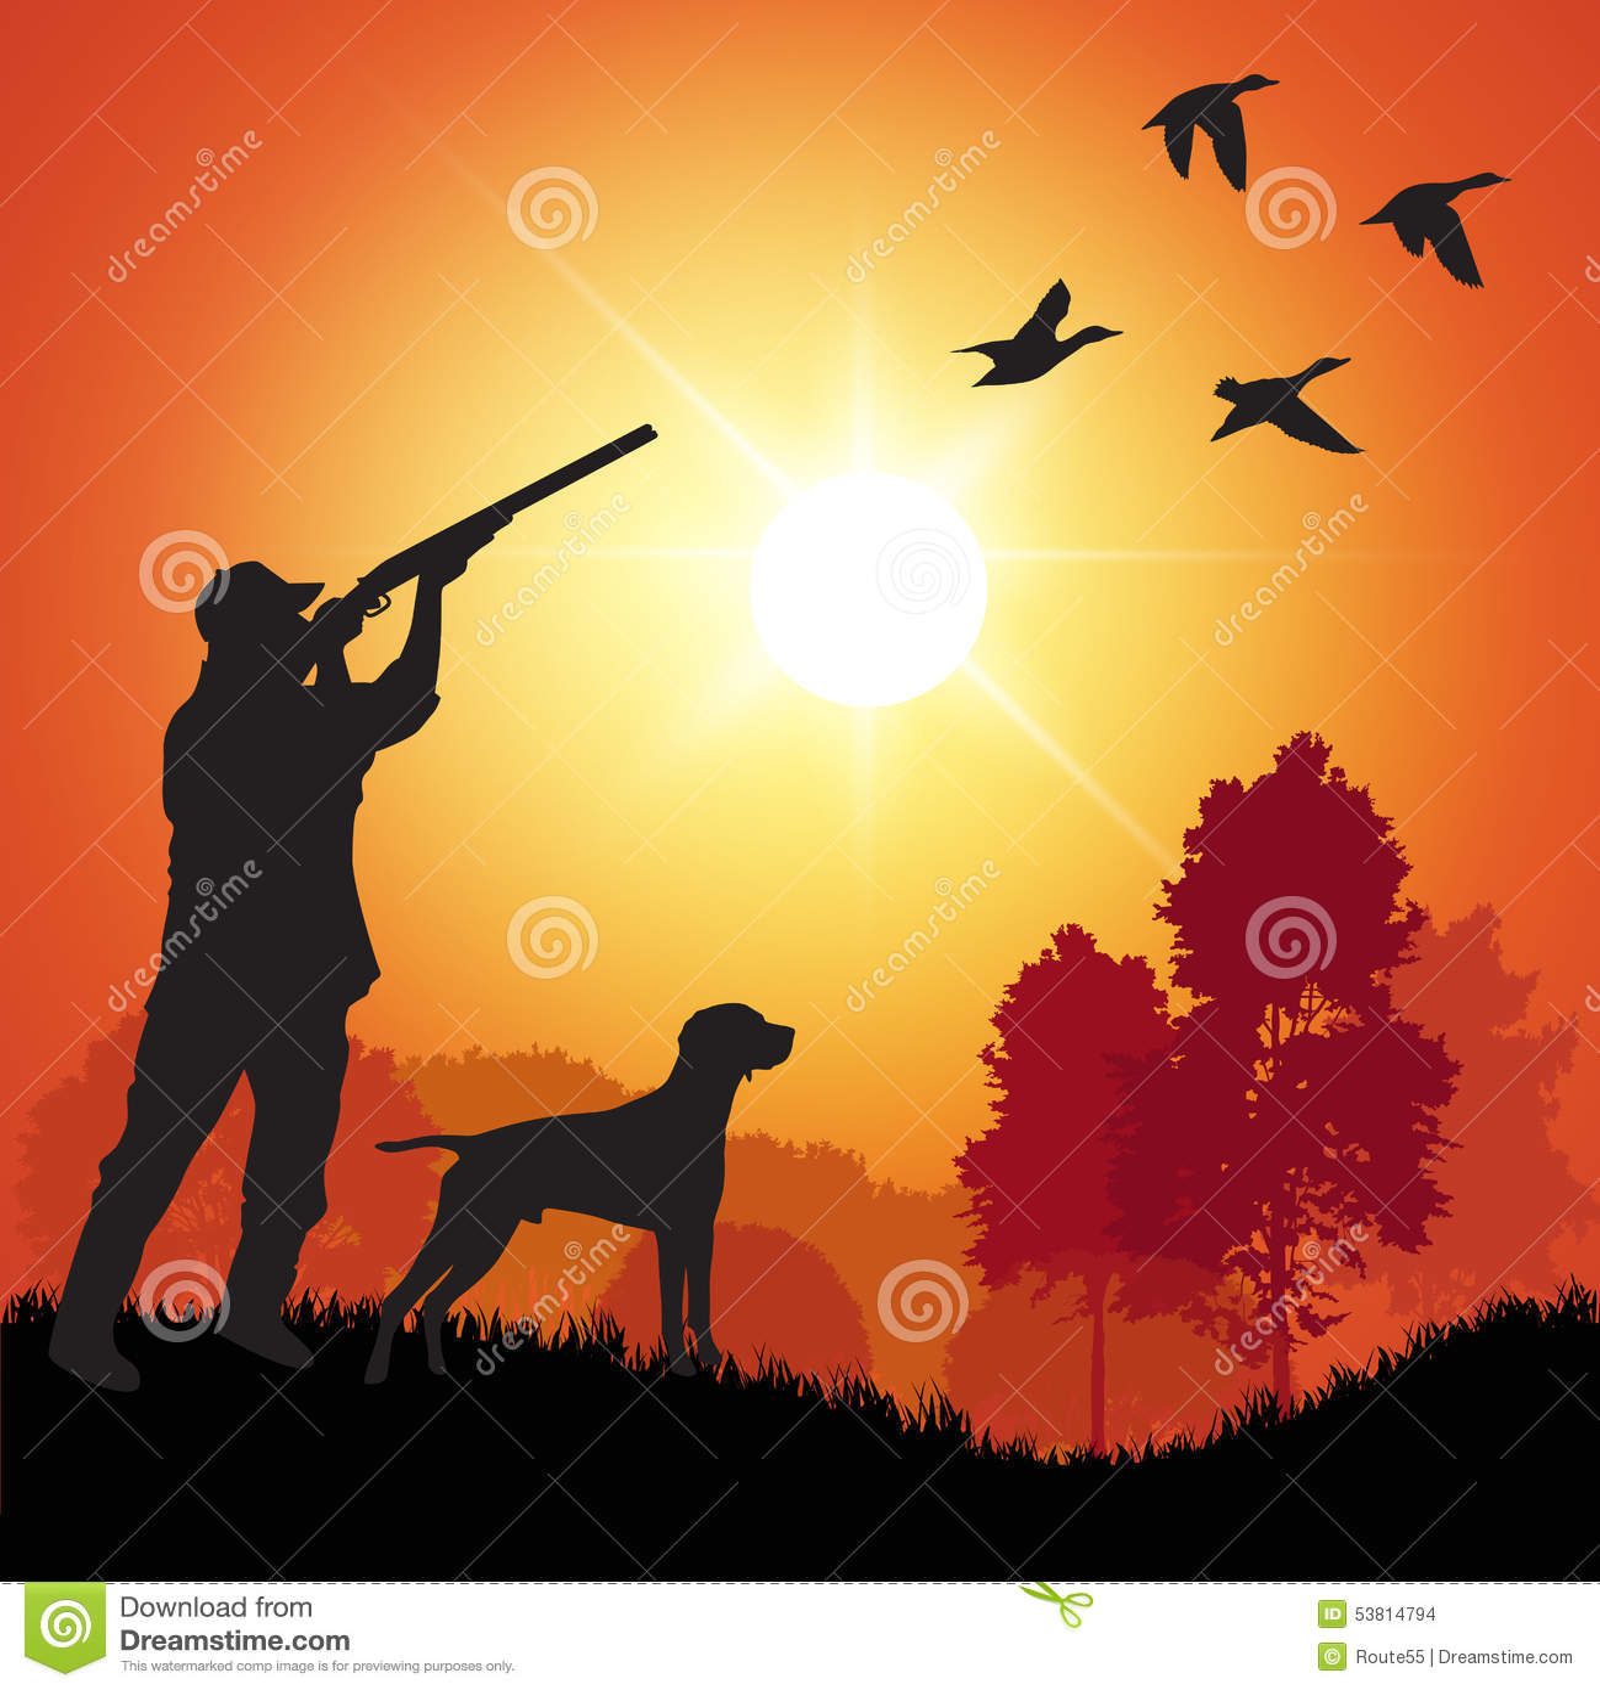 Duck Hunter Stock Vector - Image: 53814794